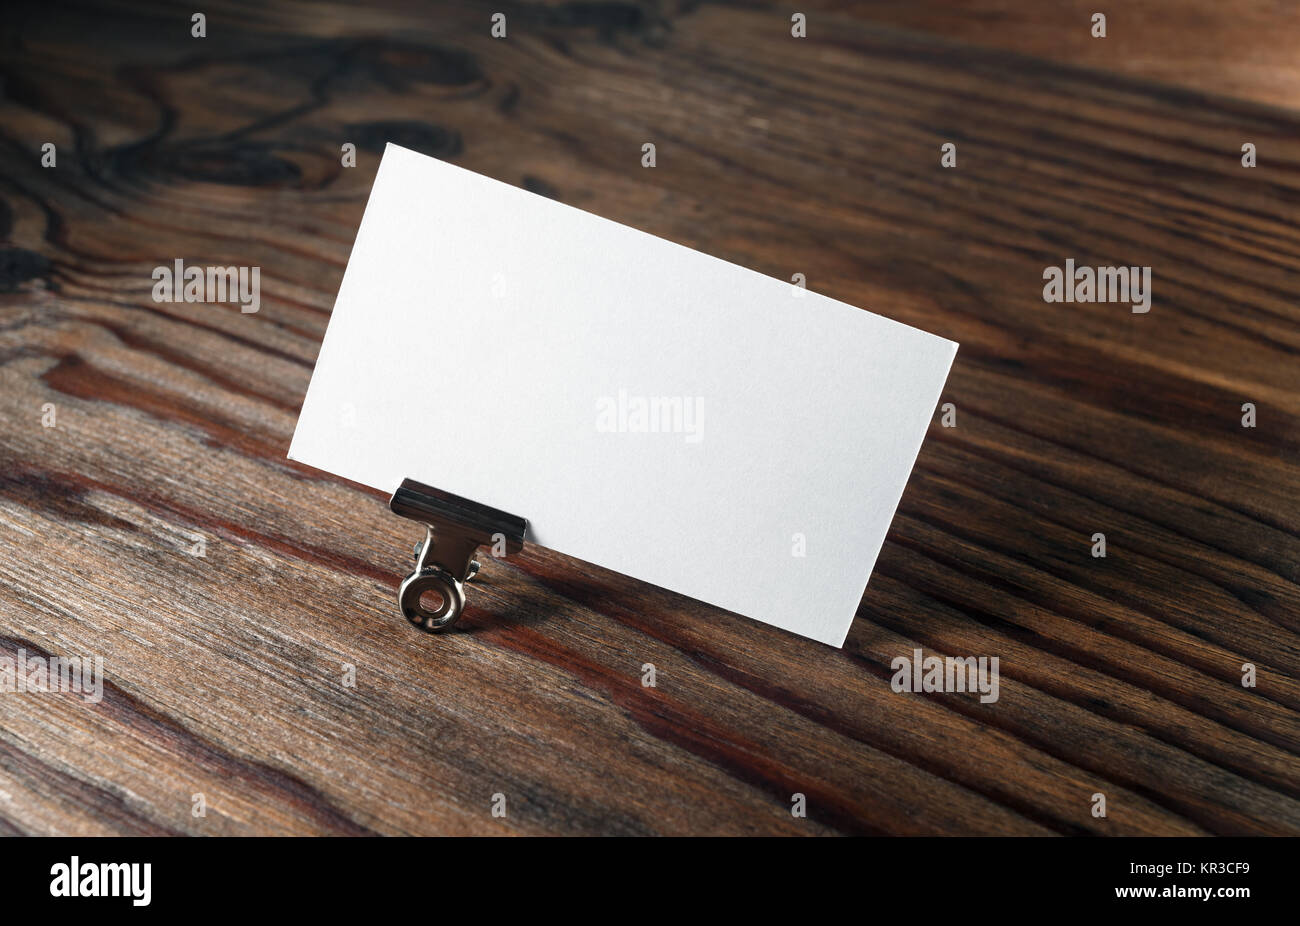 Blank business card Stock Photo: 169106093 - Alamy